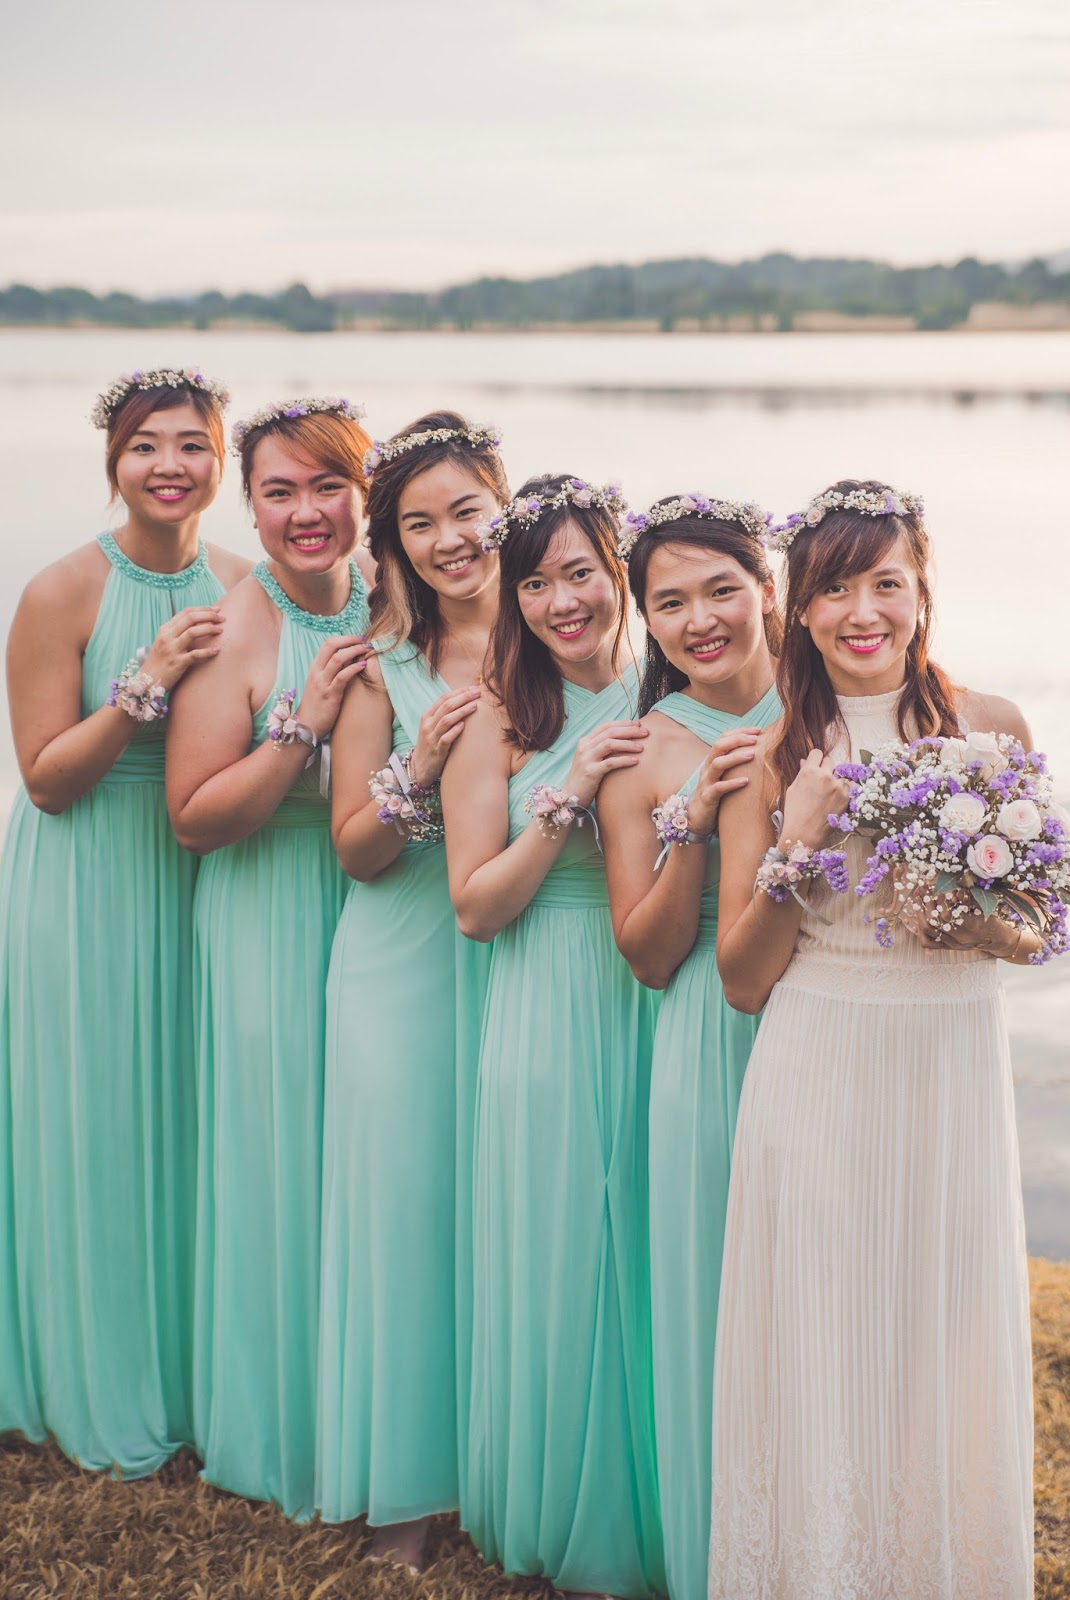 Bridesmaids Photoshoot & Hen\'s Night Party - Kaiting Hearts